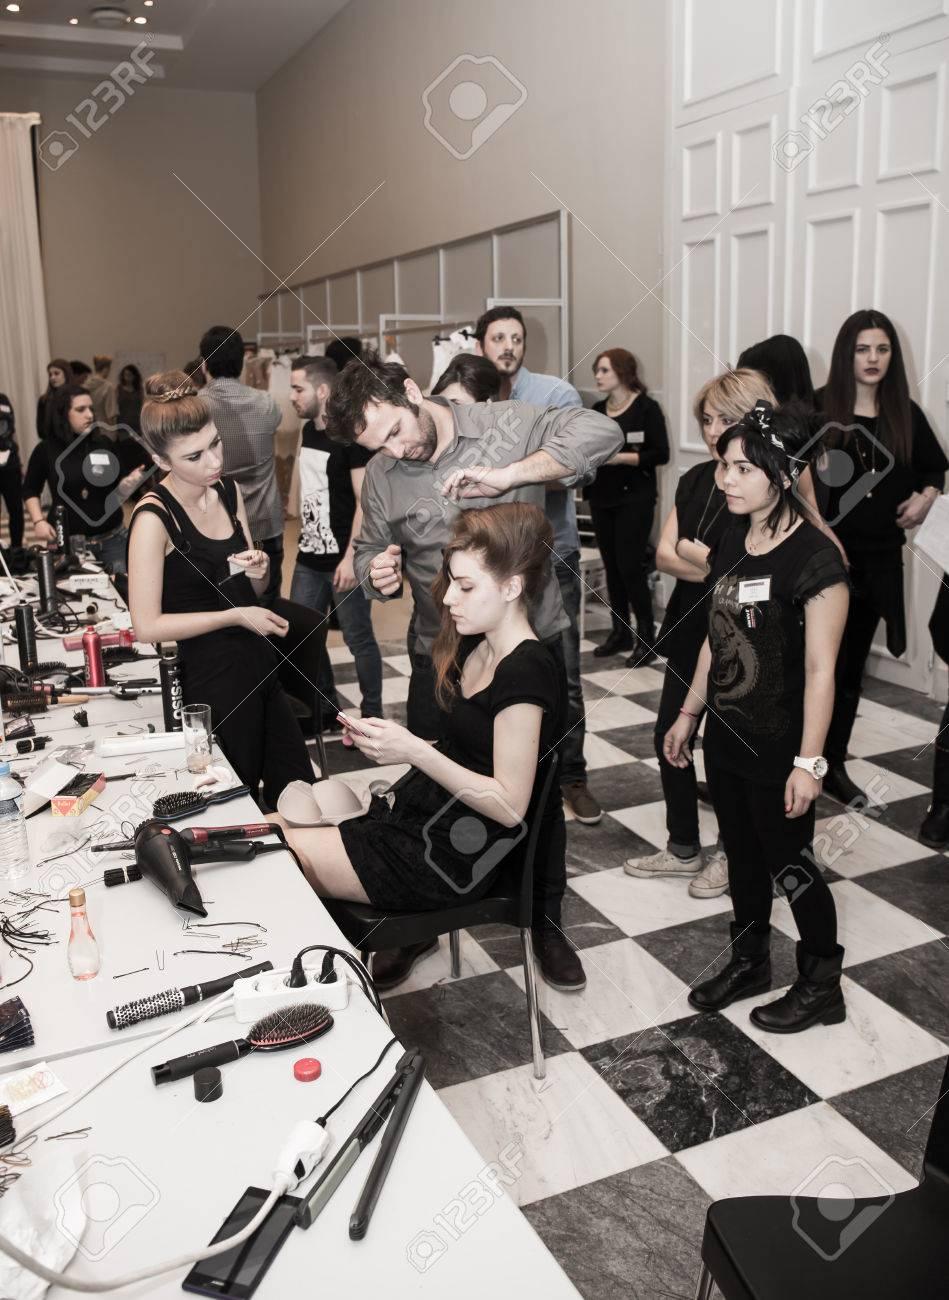 Make up, Nackstage, Fashion show, Zappion, Athens, Greece, 11 January 2015 - 35730027